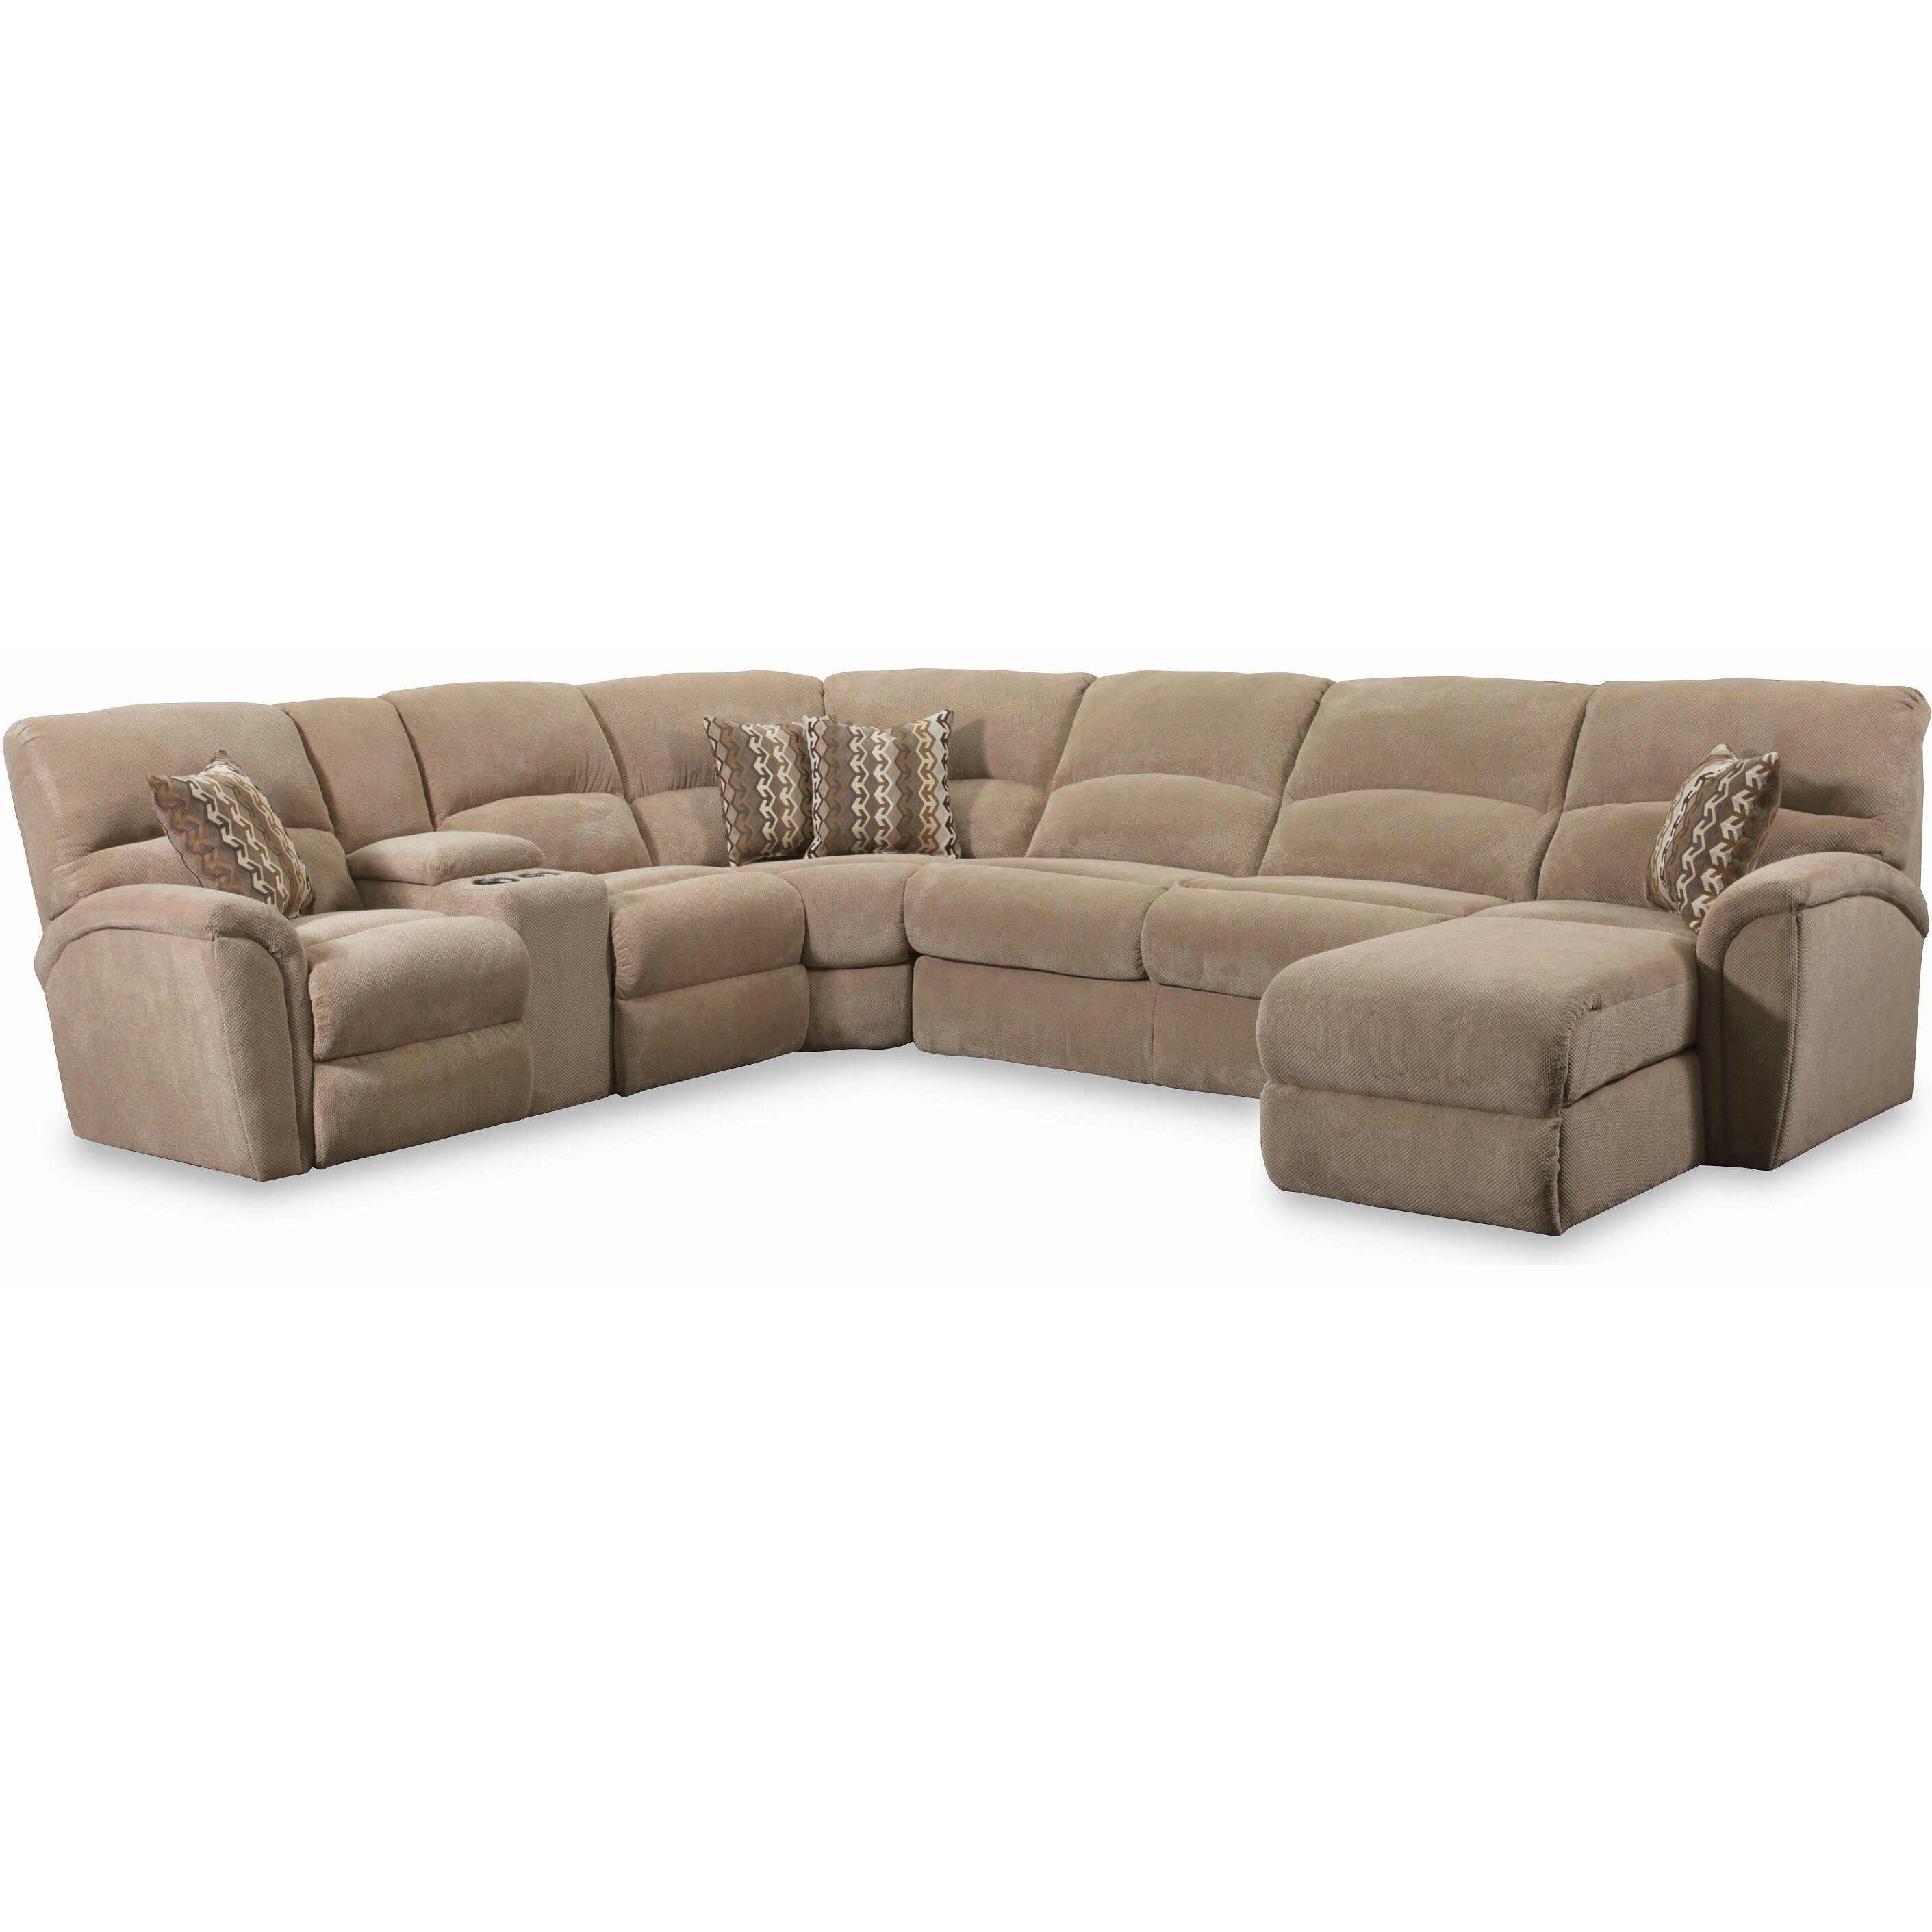 Ricardo Leather Sectional Sofa – Loopon Sofa